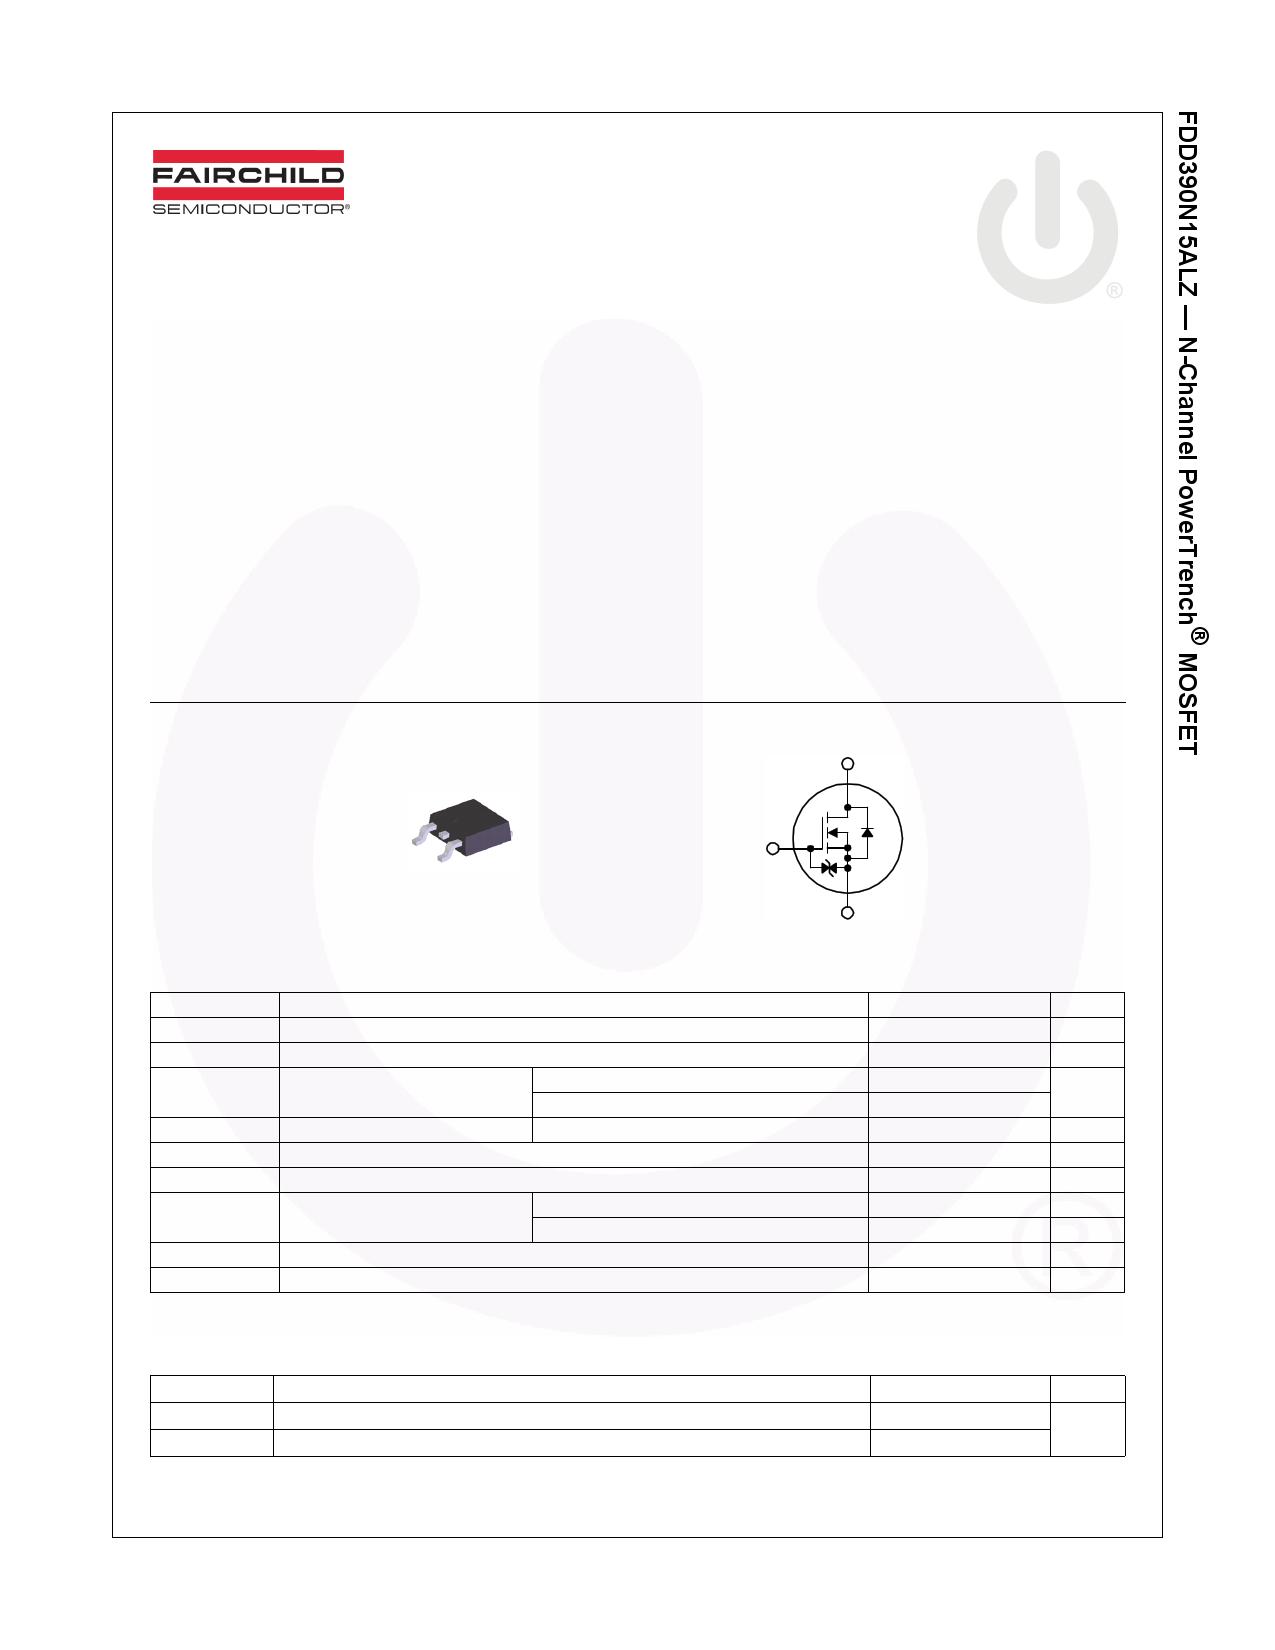 FDD390N15ALZ 데이터시트 및 FDD390N15ALZ PDF